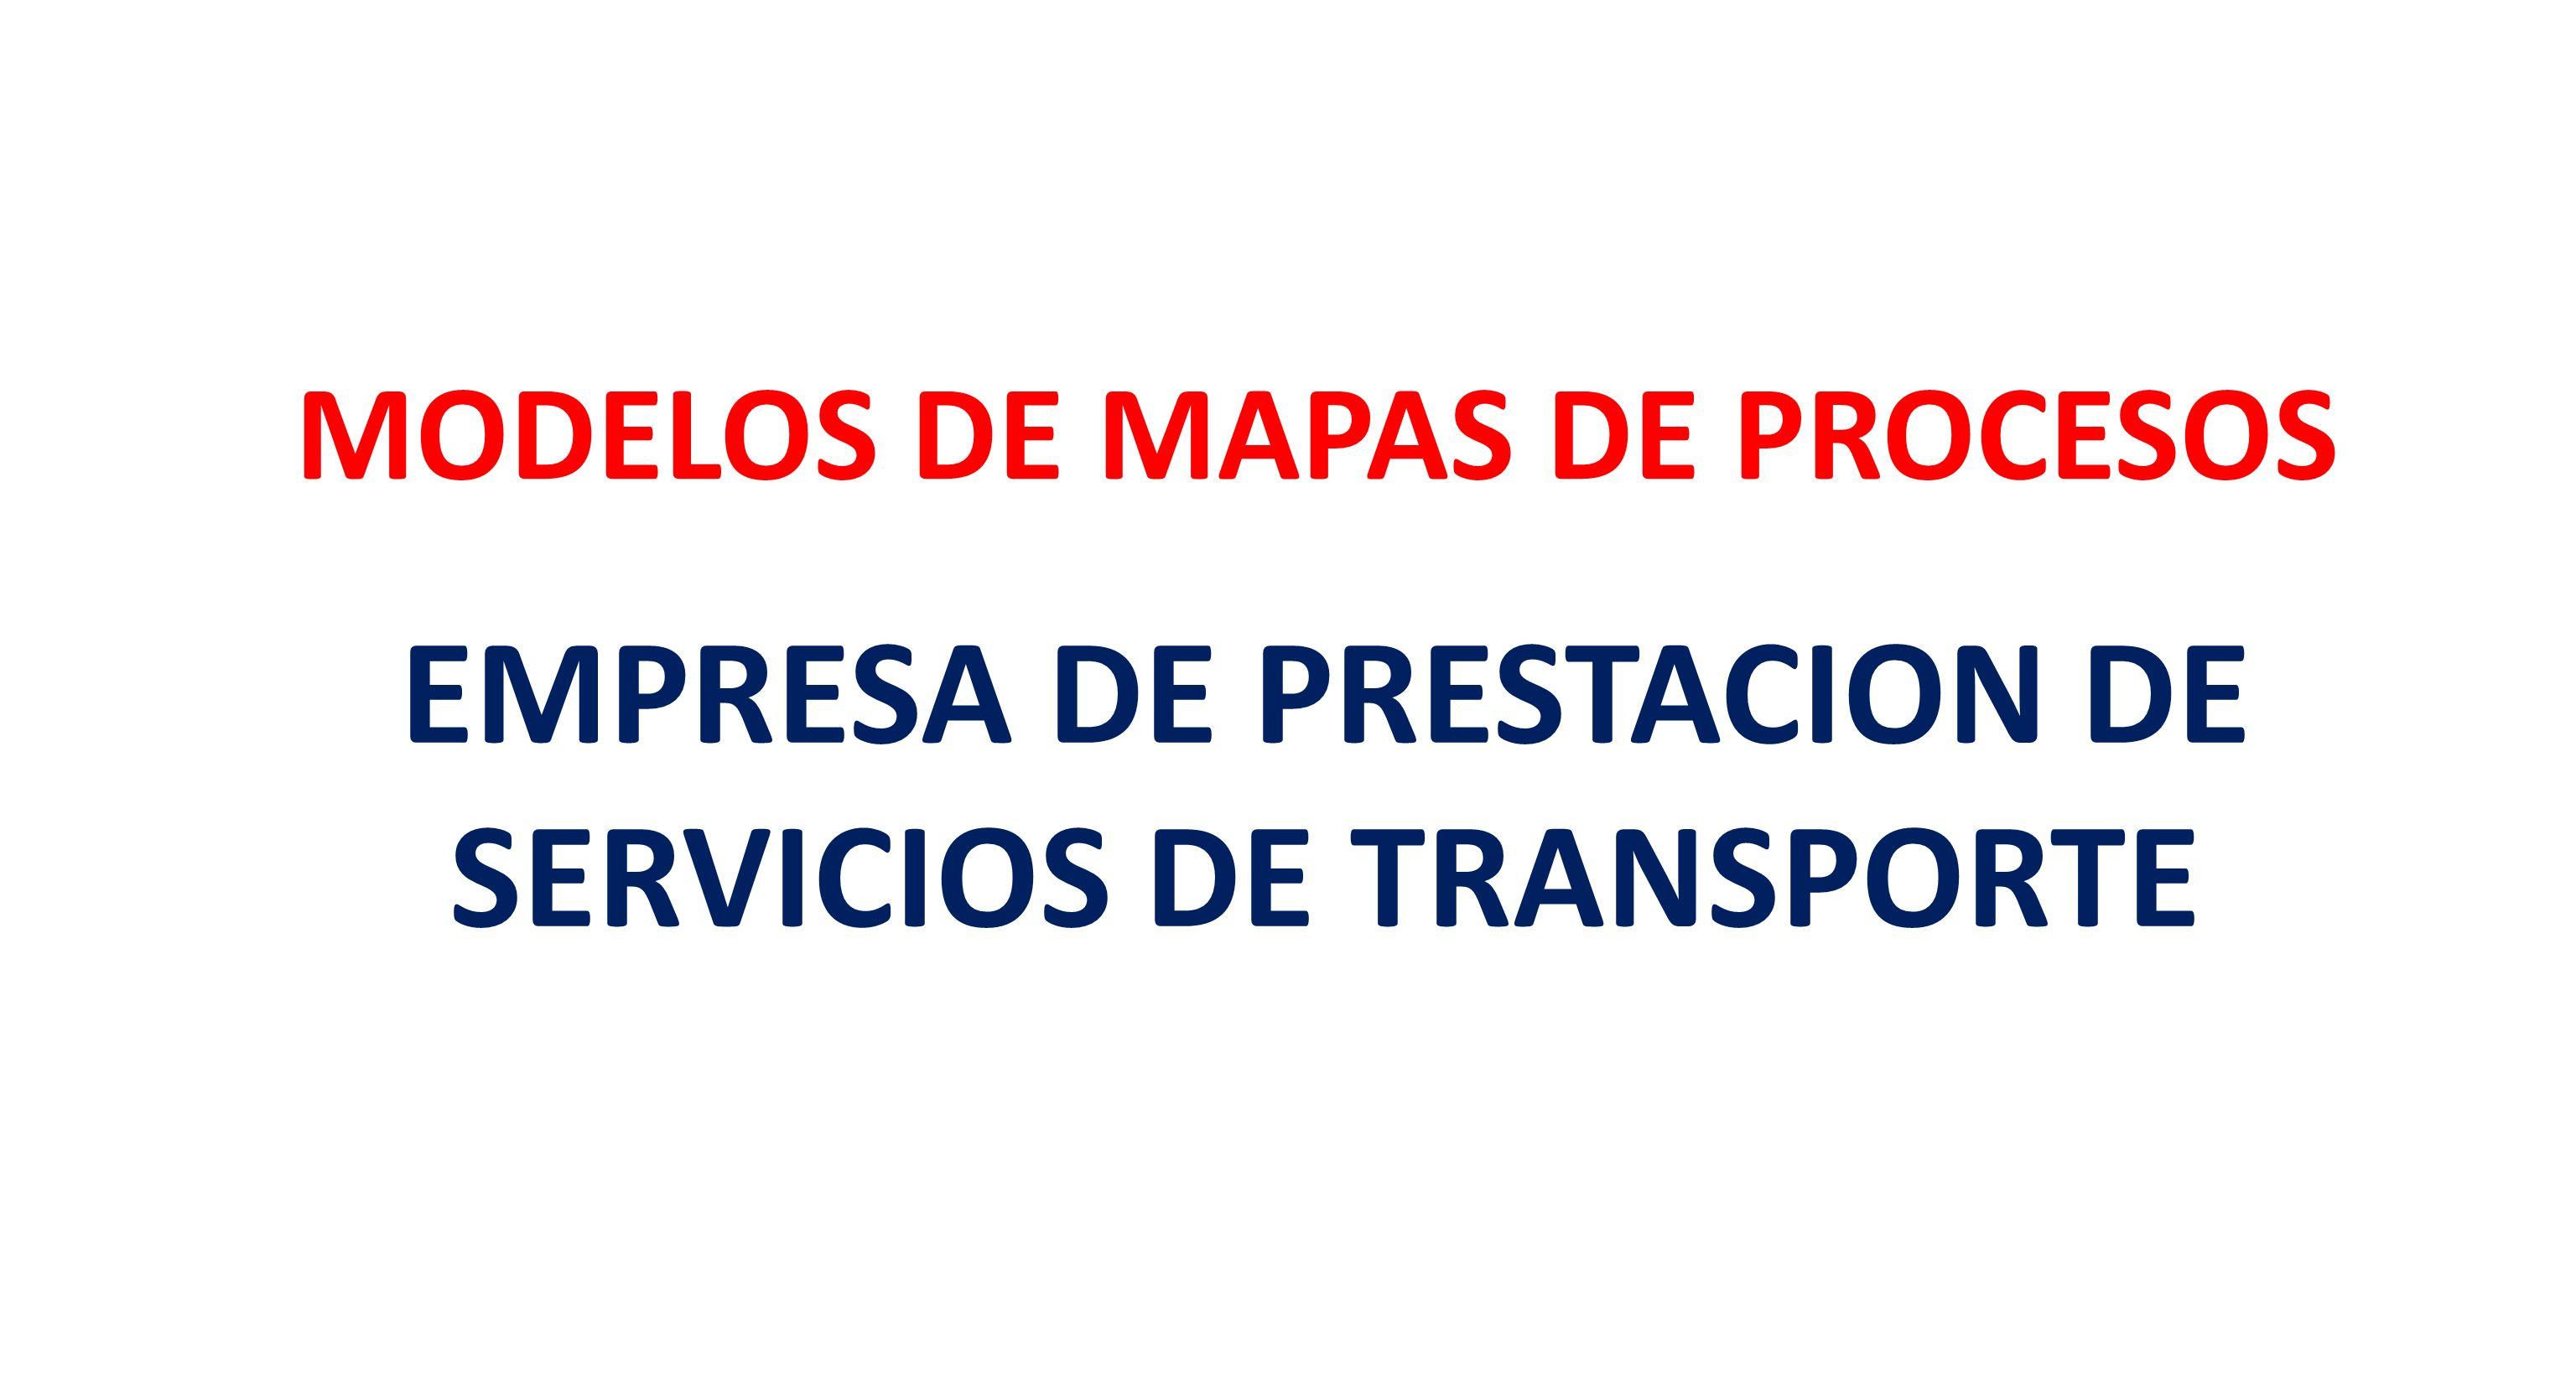 MODELOS DE MAPAS DE PROCESOS EMPRESA DE PRESTACION DE SERVICIOS DE TRANSPORTE